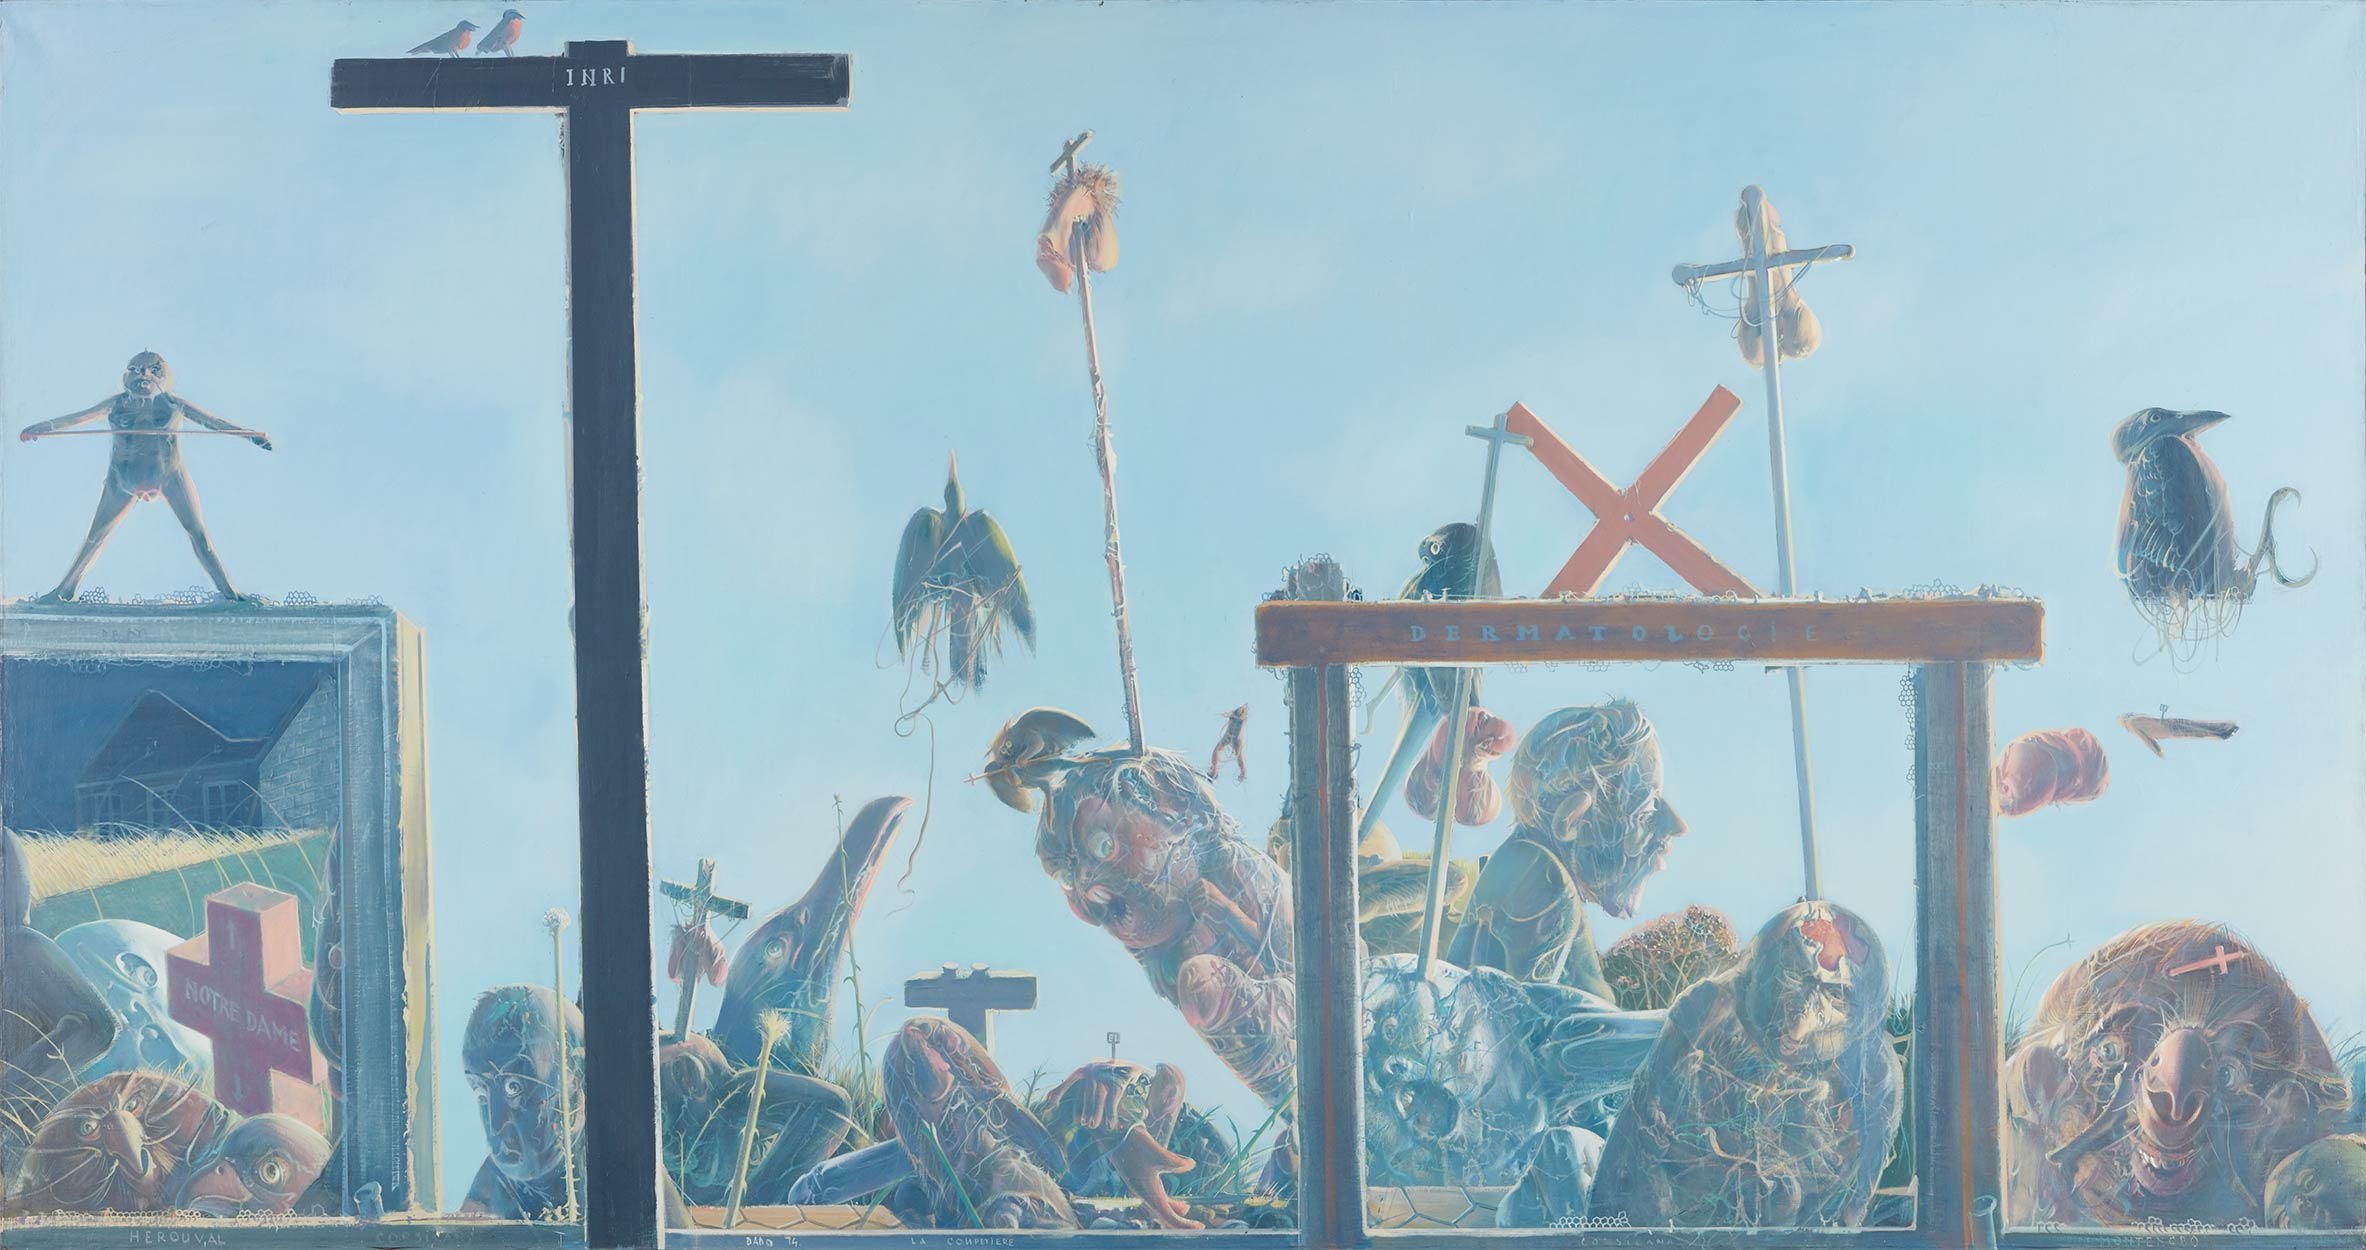 Dado (Miodrag Djuric): The Way of the Cross